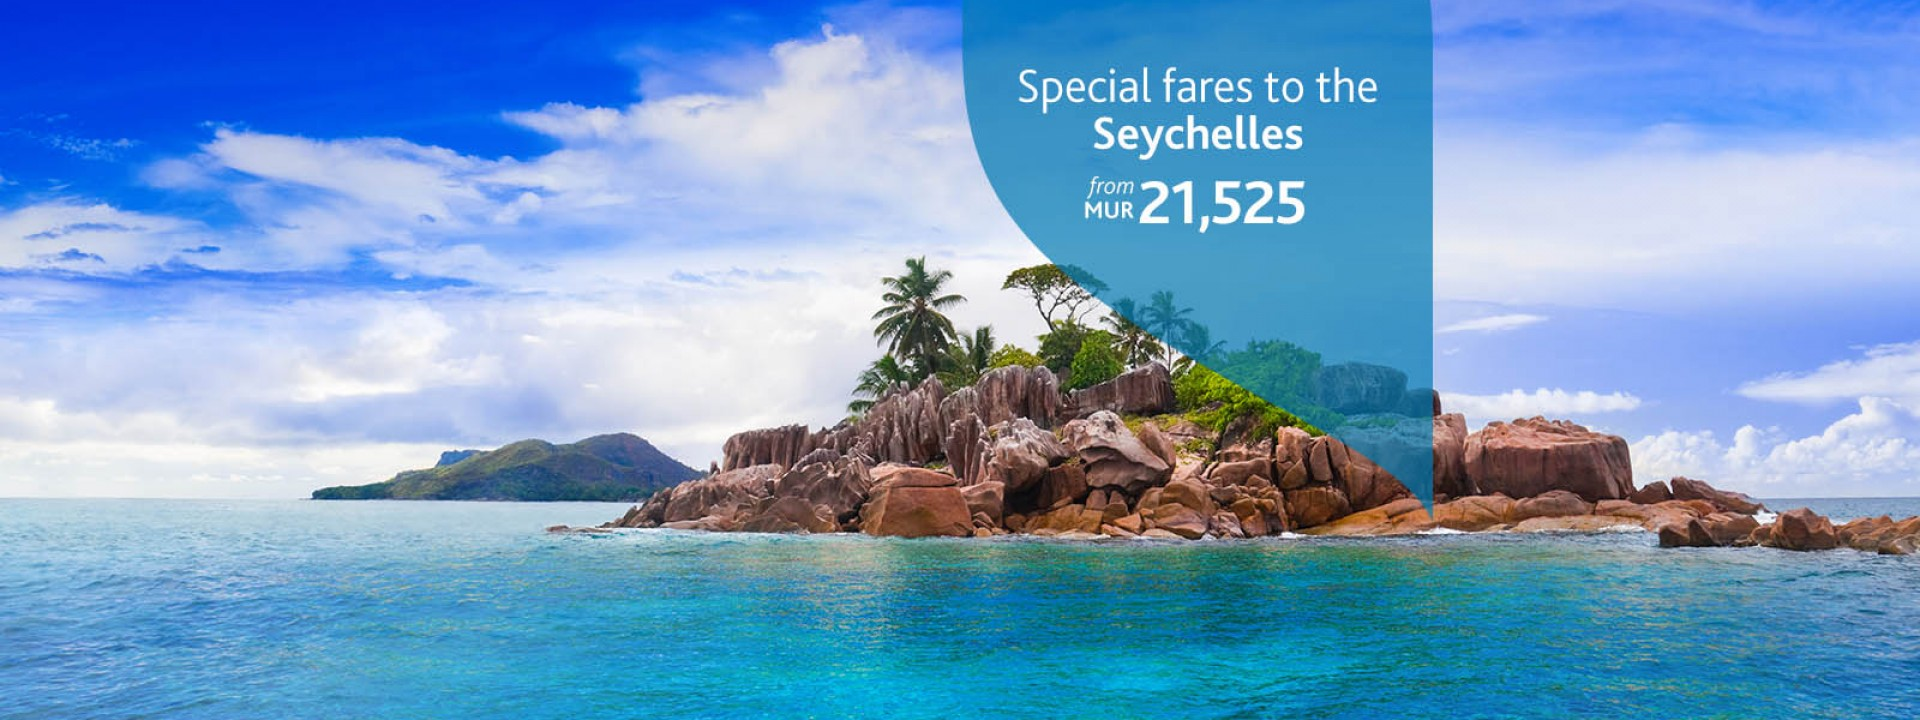 flights-from-mauritius-to-mahe-seychelles-economy